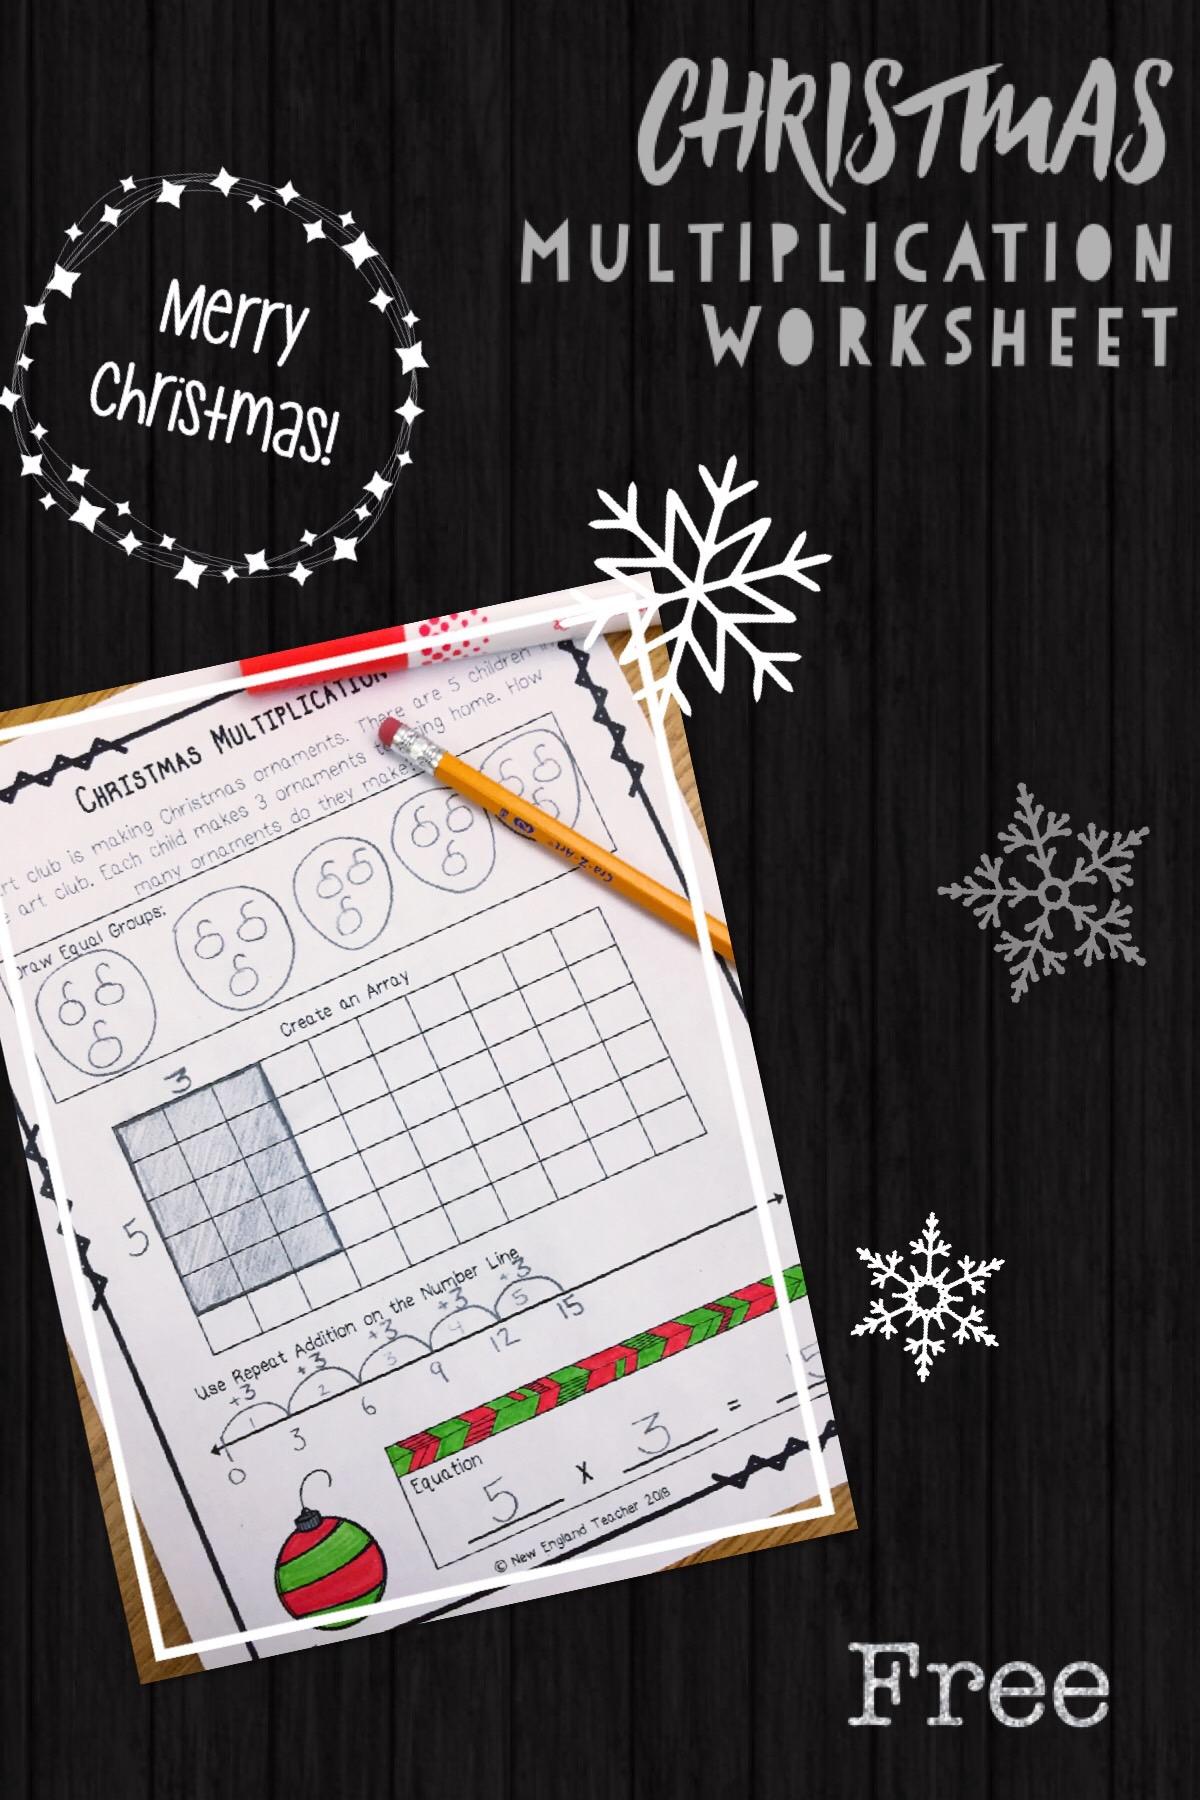 Free Christmas Multiplication Worksheet New England Teacher